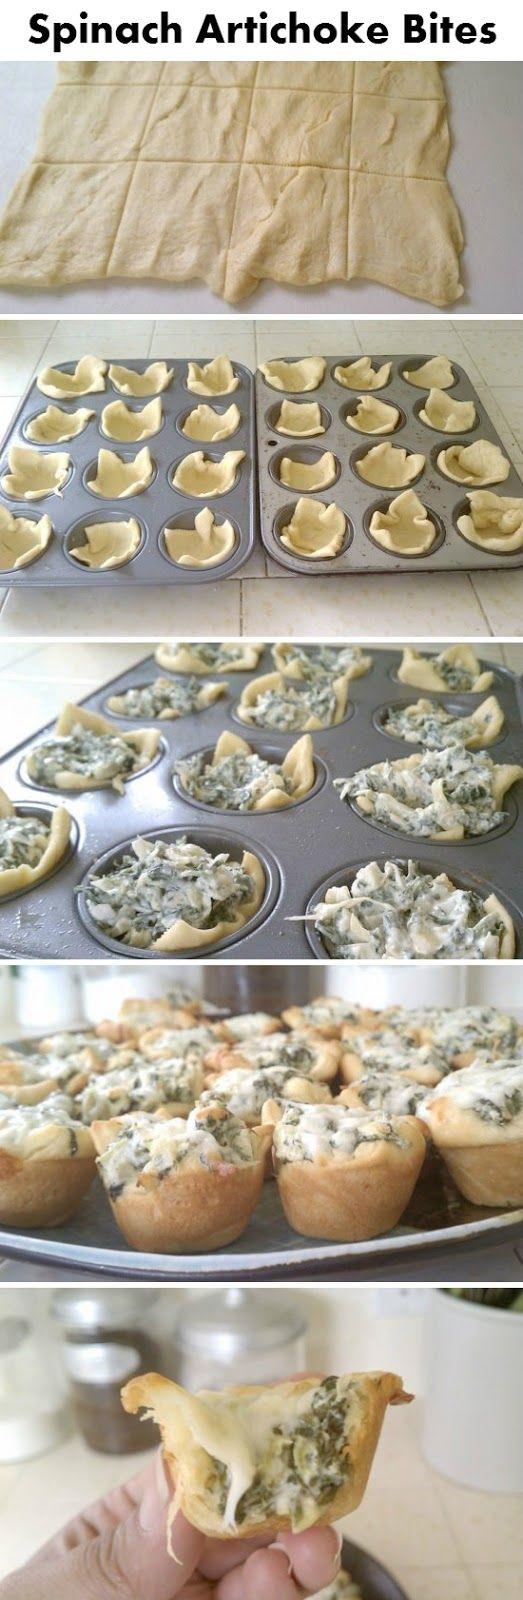 Spinach Artichoke Bites- make w/ crescent roll dough! Yumm!!